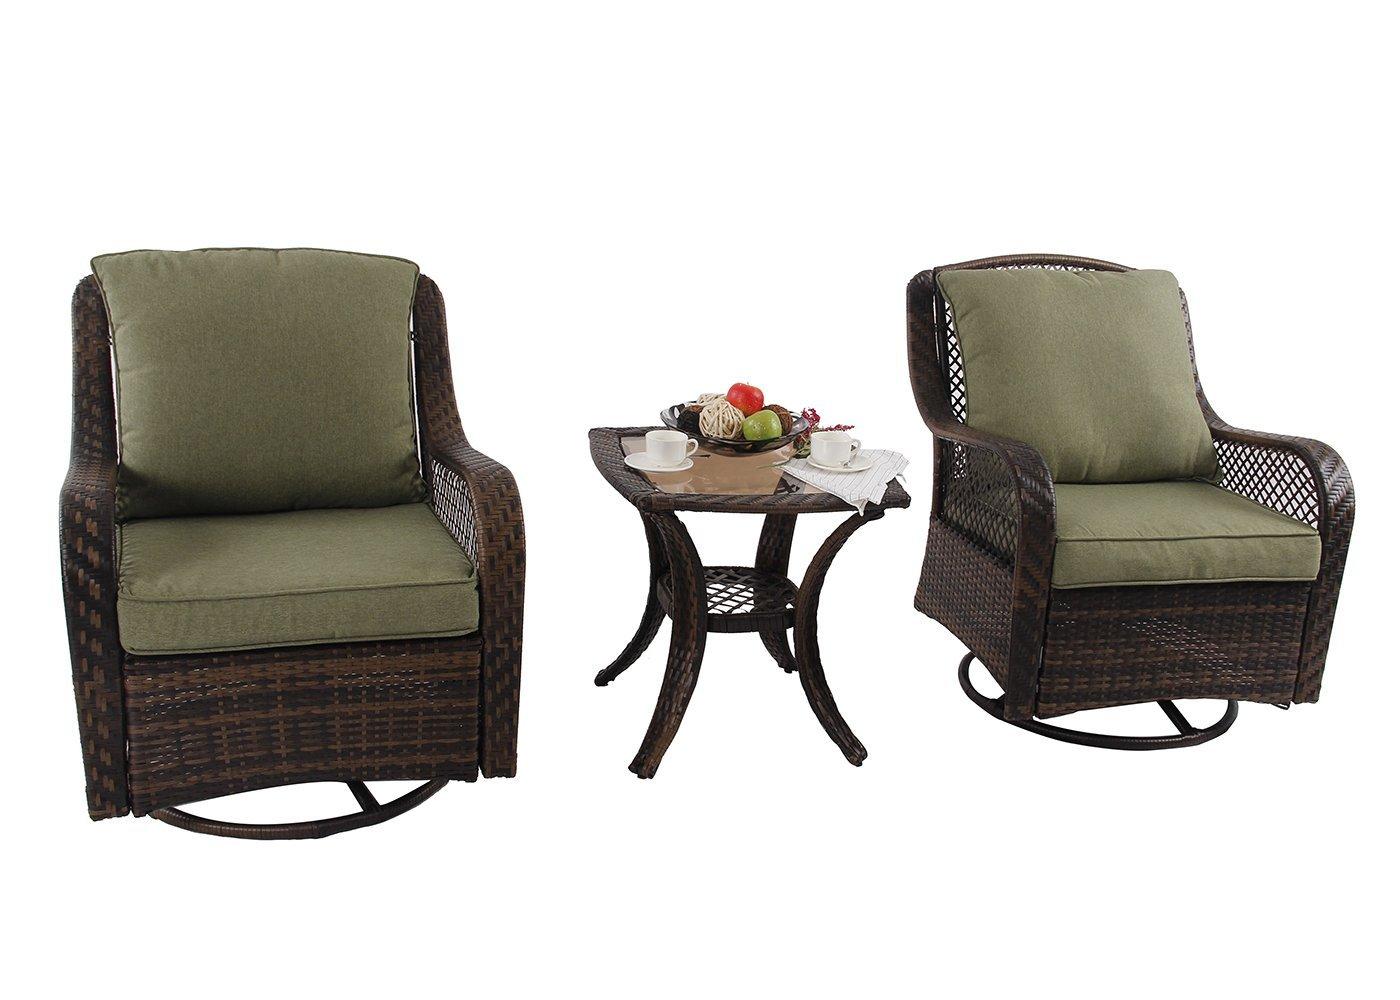 Luxury Furniture Review Phi Villa Patio Outdoor 3 Piece